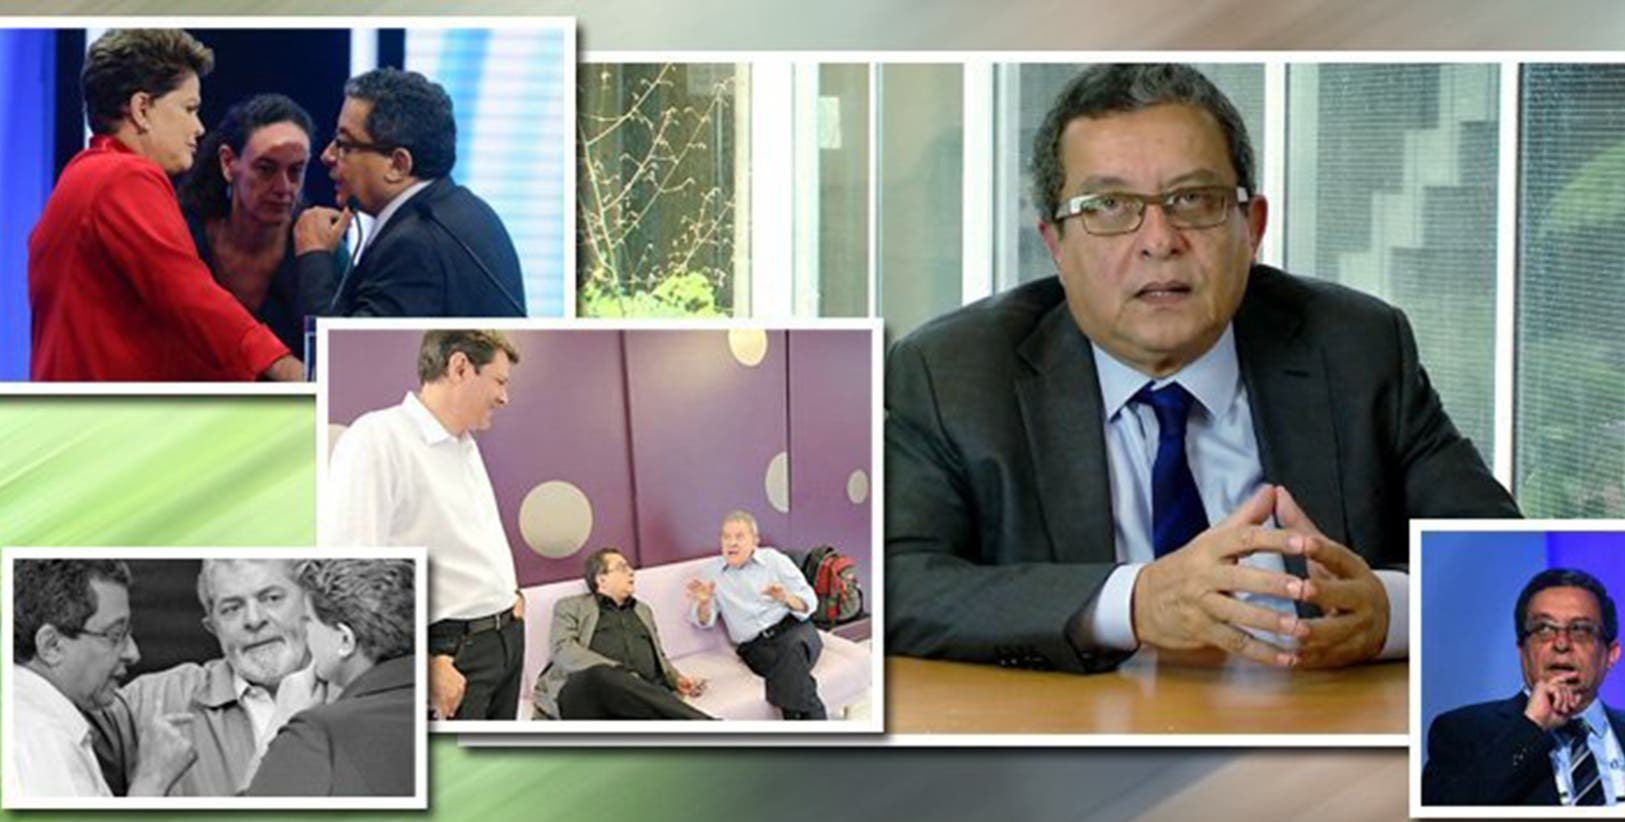 Investigación contra exasesor de Danilo Medina tenía cerca de un año